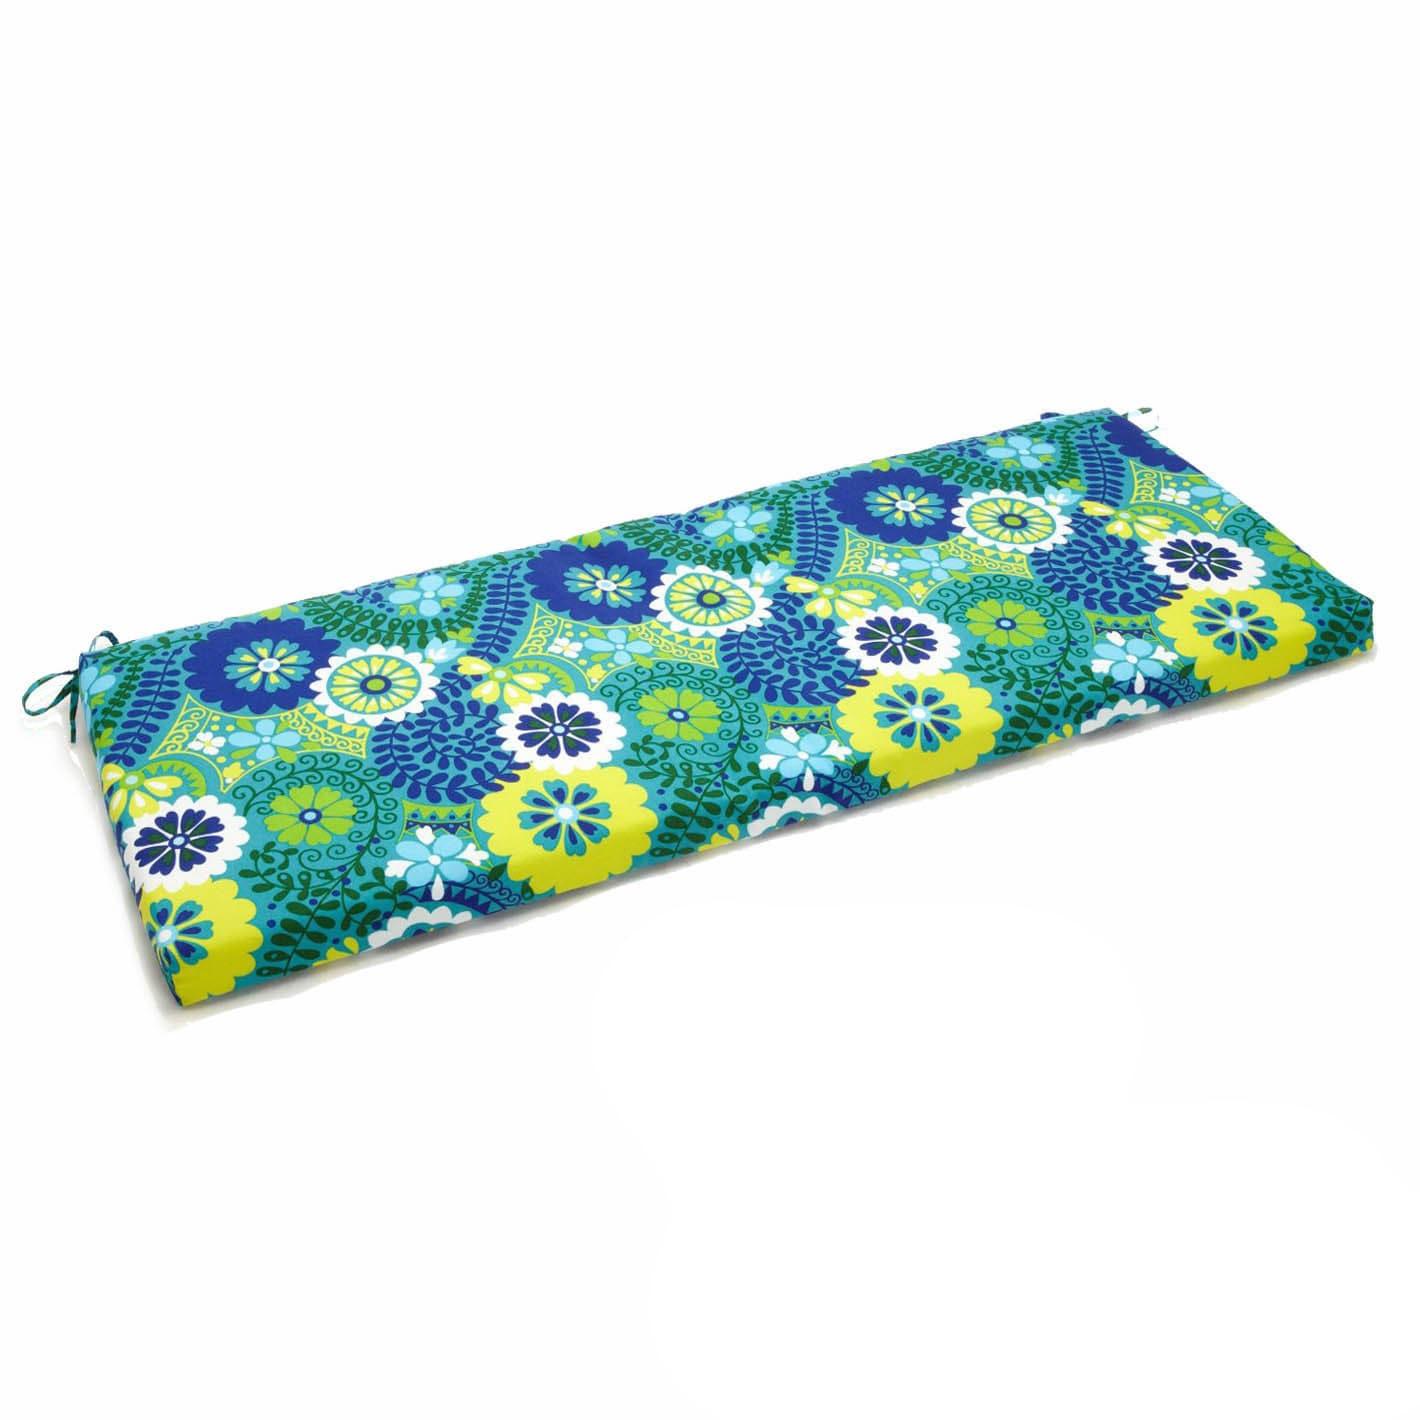 Blazing Needles Designer 48 inch Outdoor Bench Cushion Free